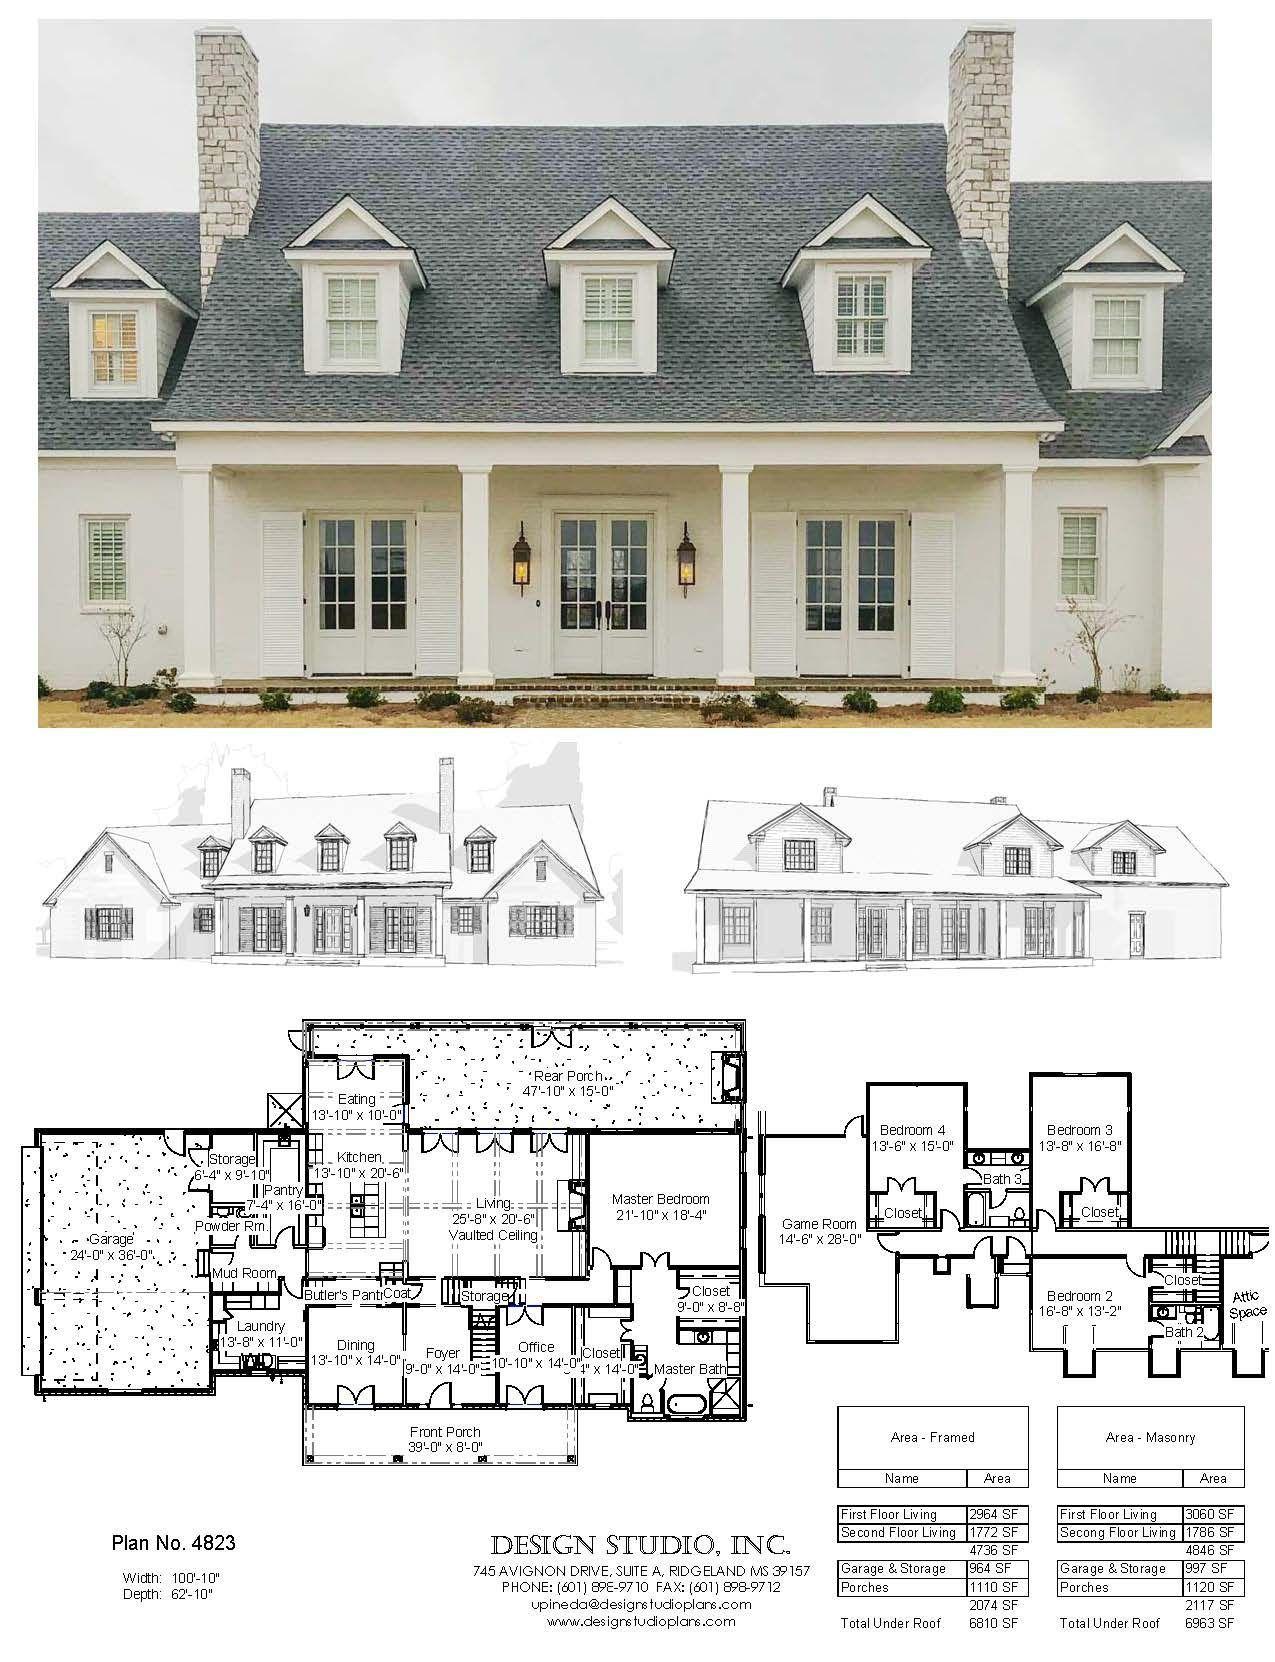 Clean Crisp White On White Newly Built Plan 4823 Designstudioplans Residentialdesign Residentialarchit In 2020 Dream House Plans House Plans Building A House